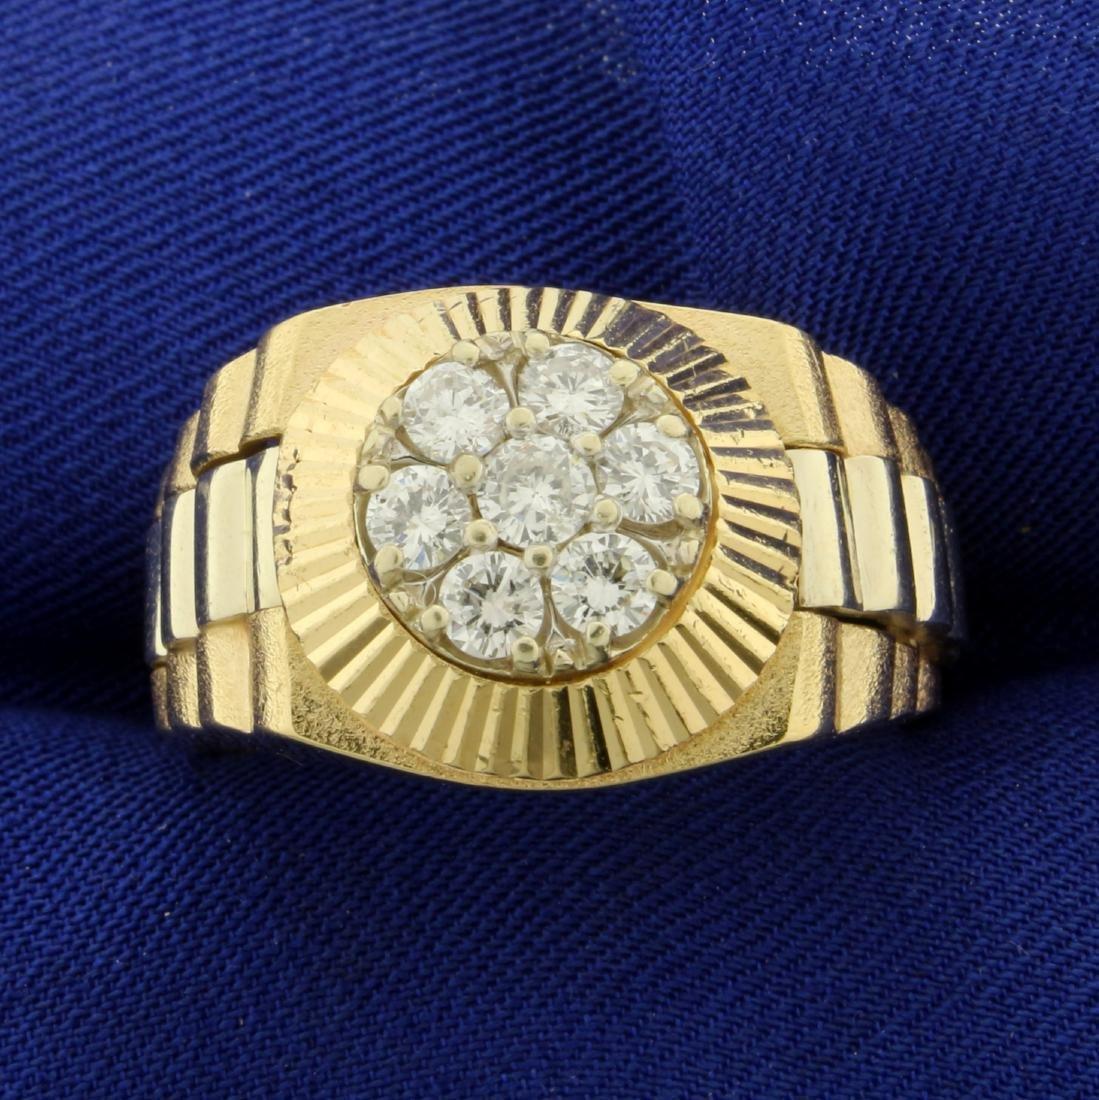 1ct TW Men's Diamond Ring in 14K Yellow Gold